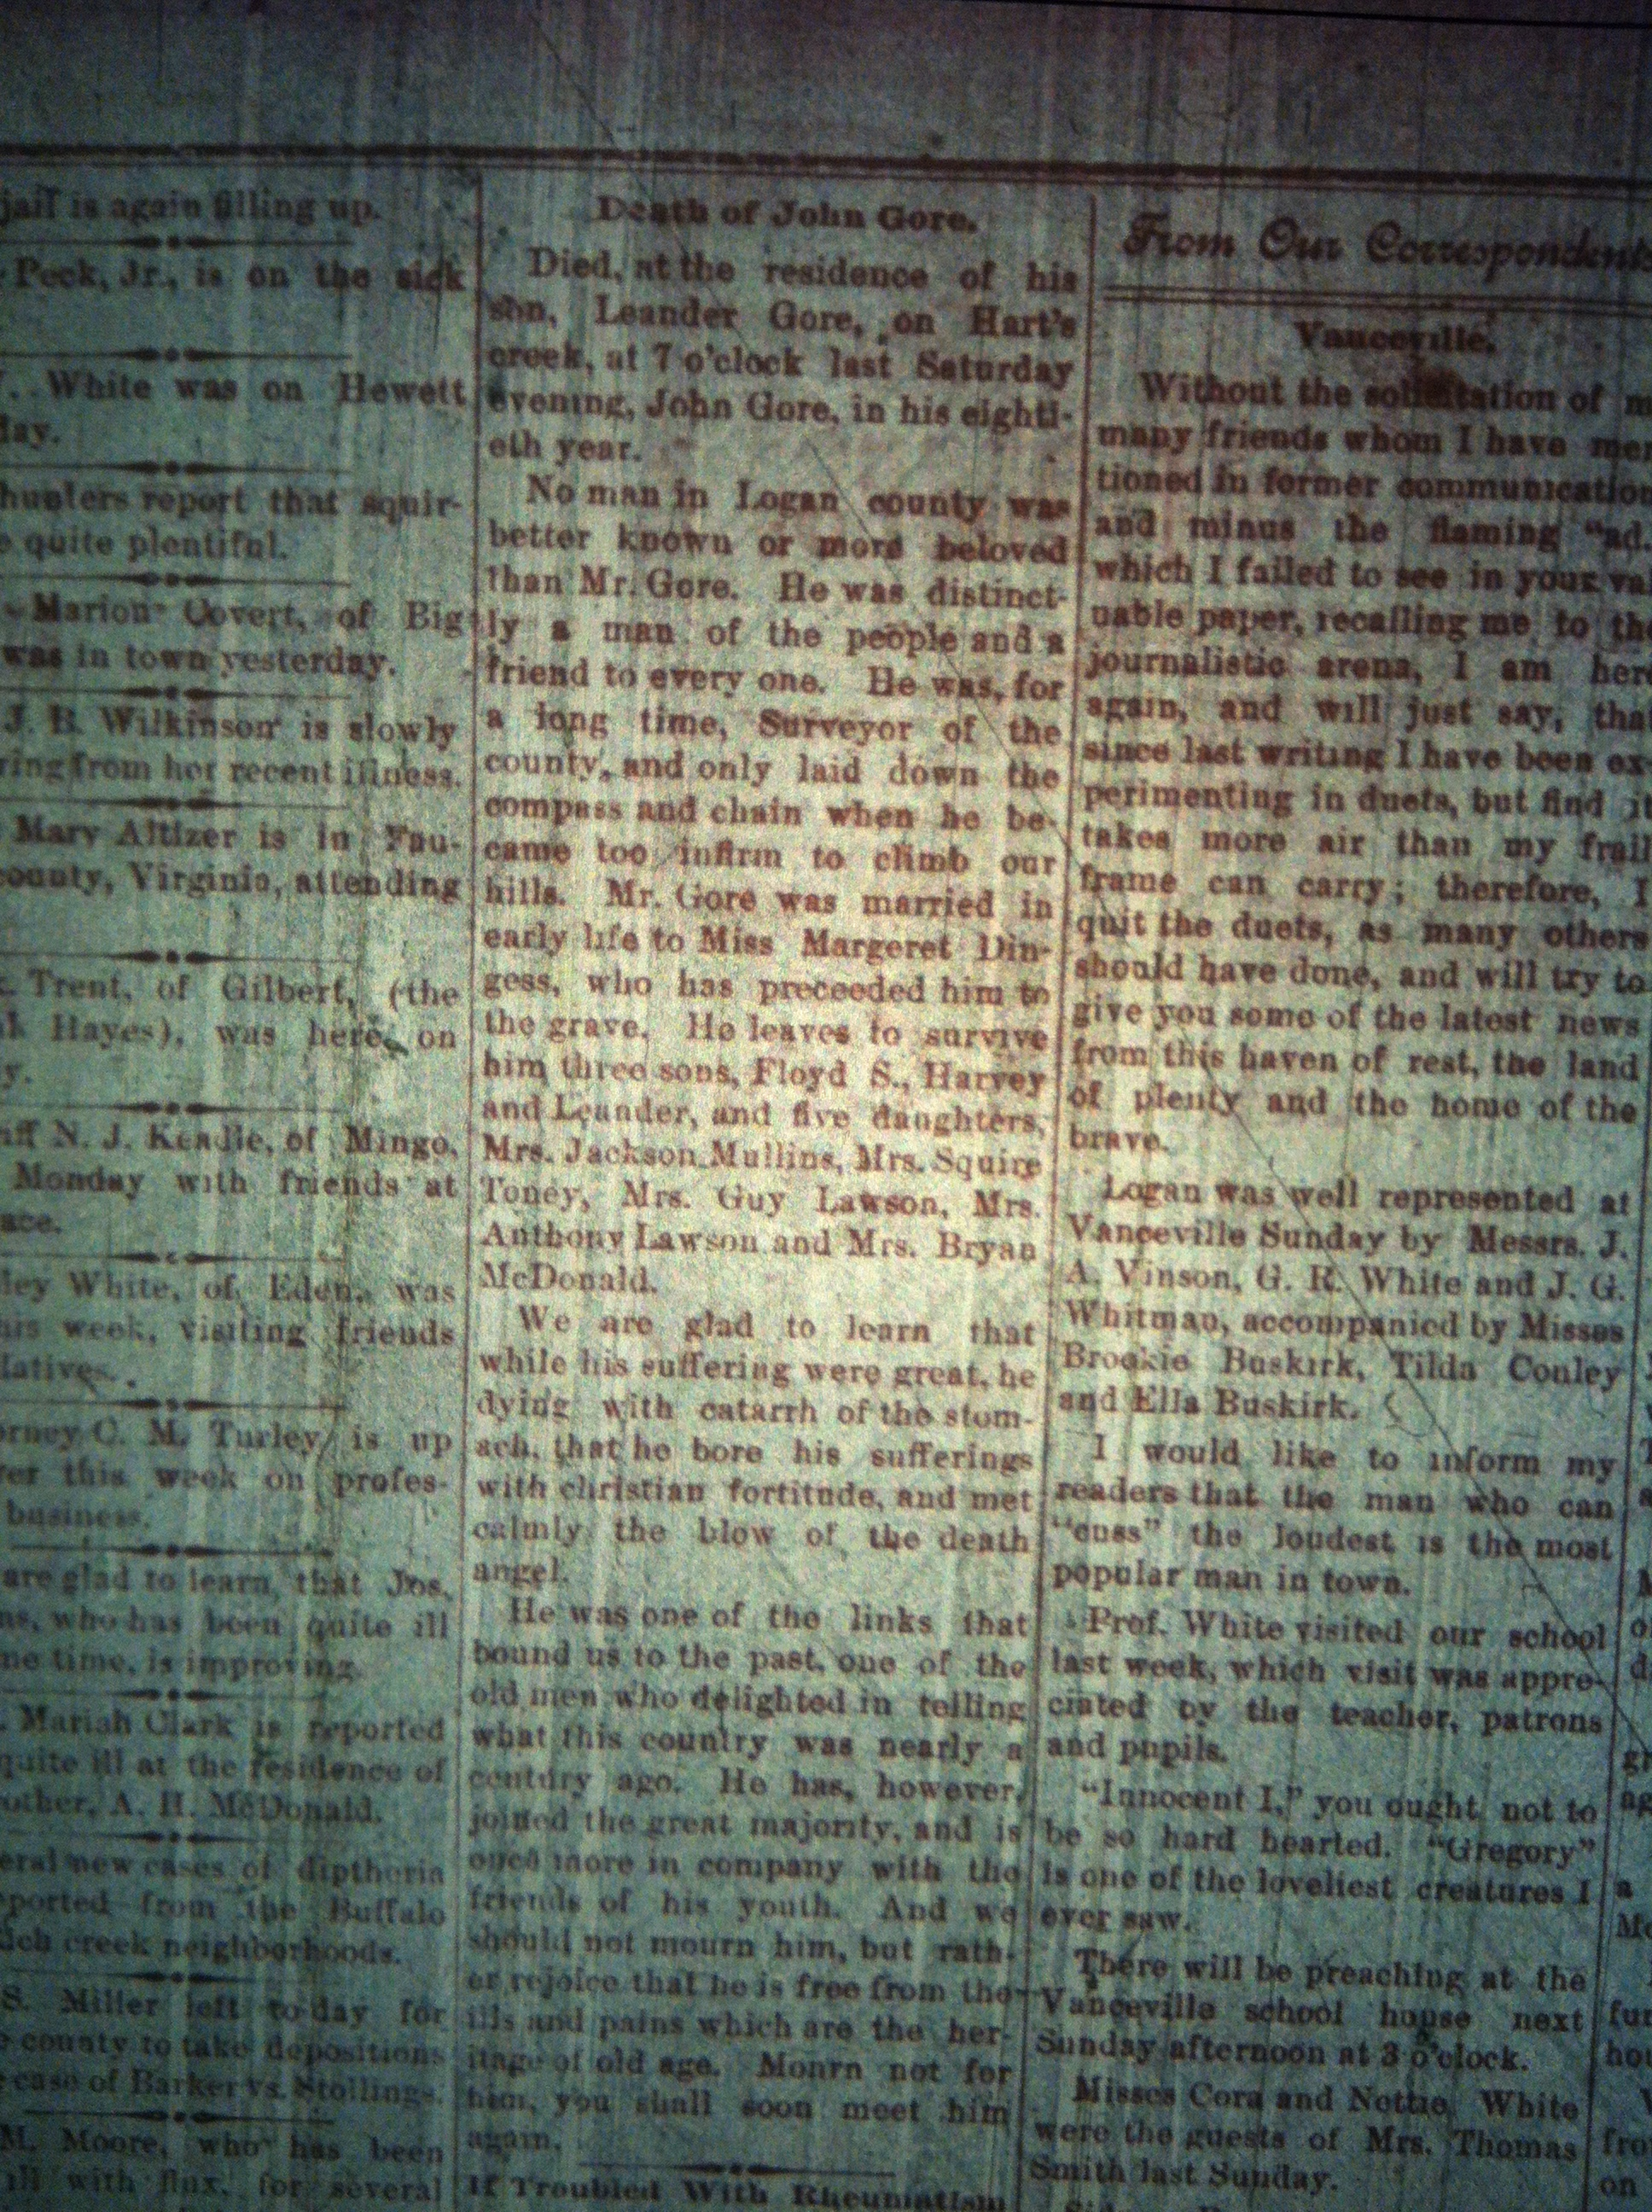 John Gore Obit 1 LCB 10.9.1895